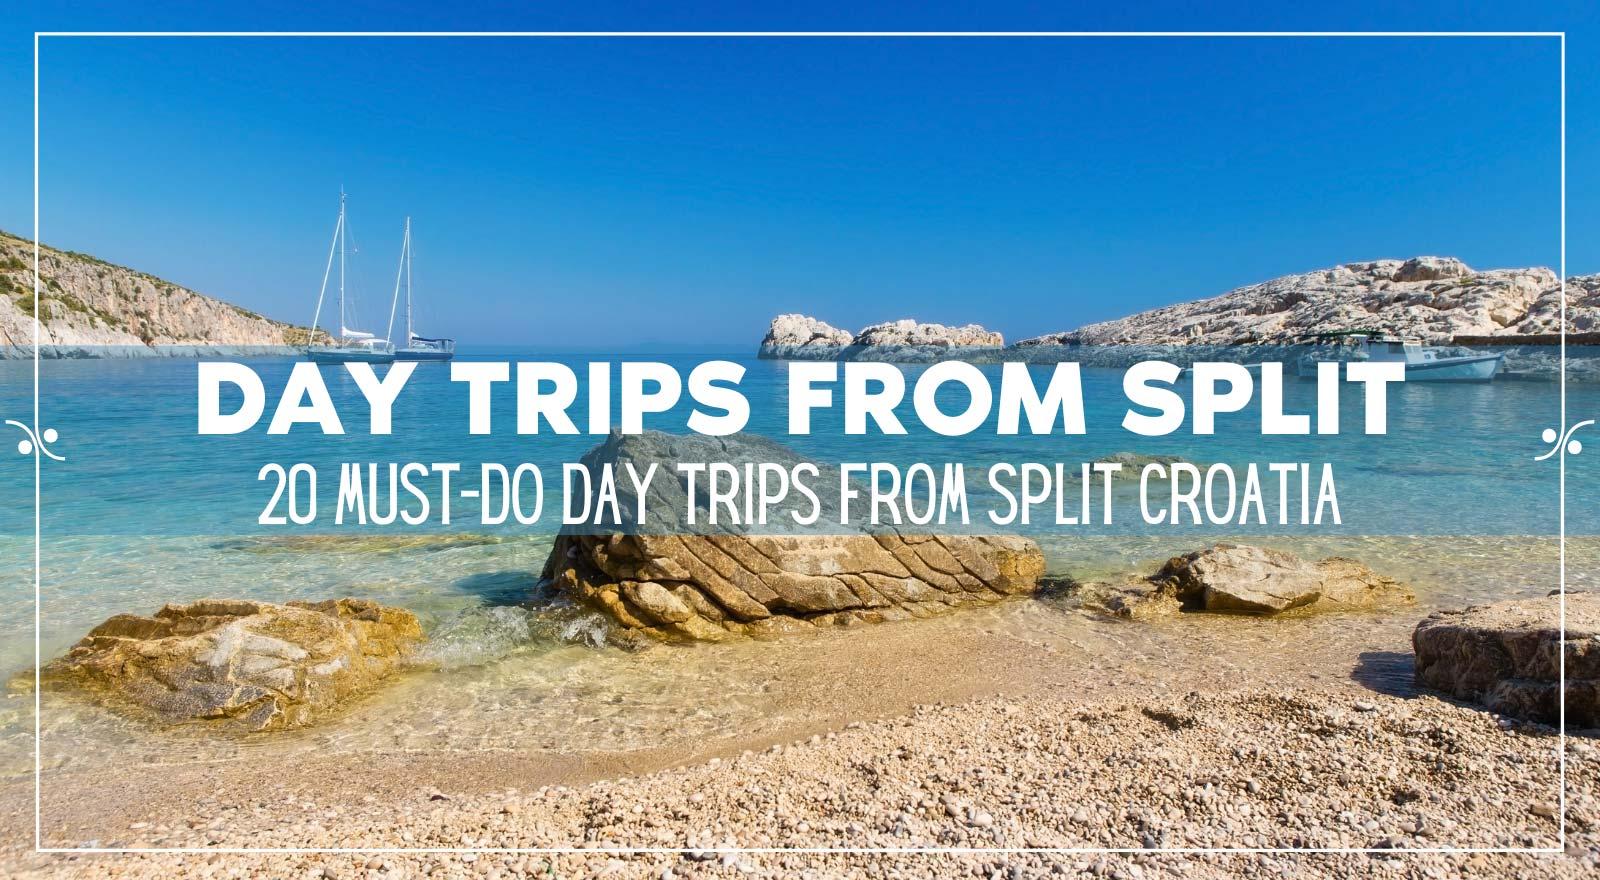 Day Trips From Split, Illustration